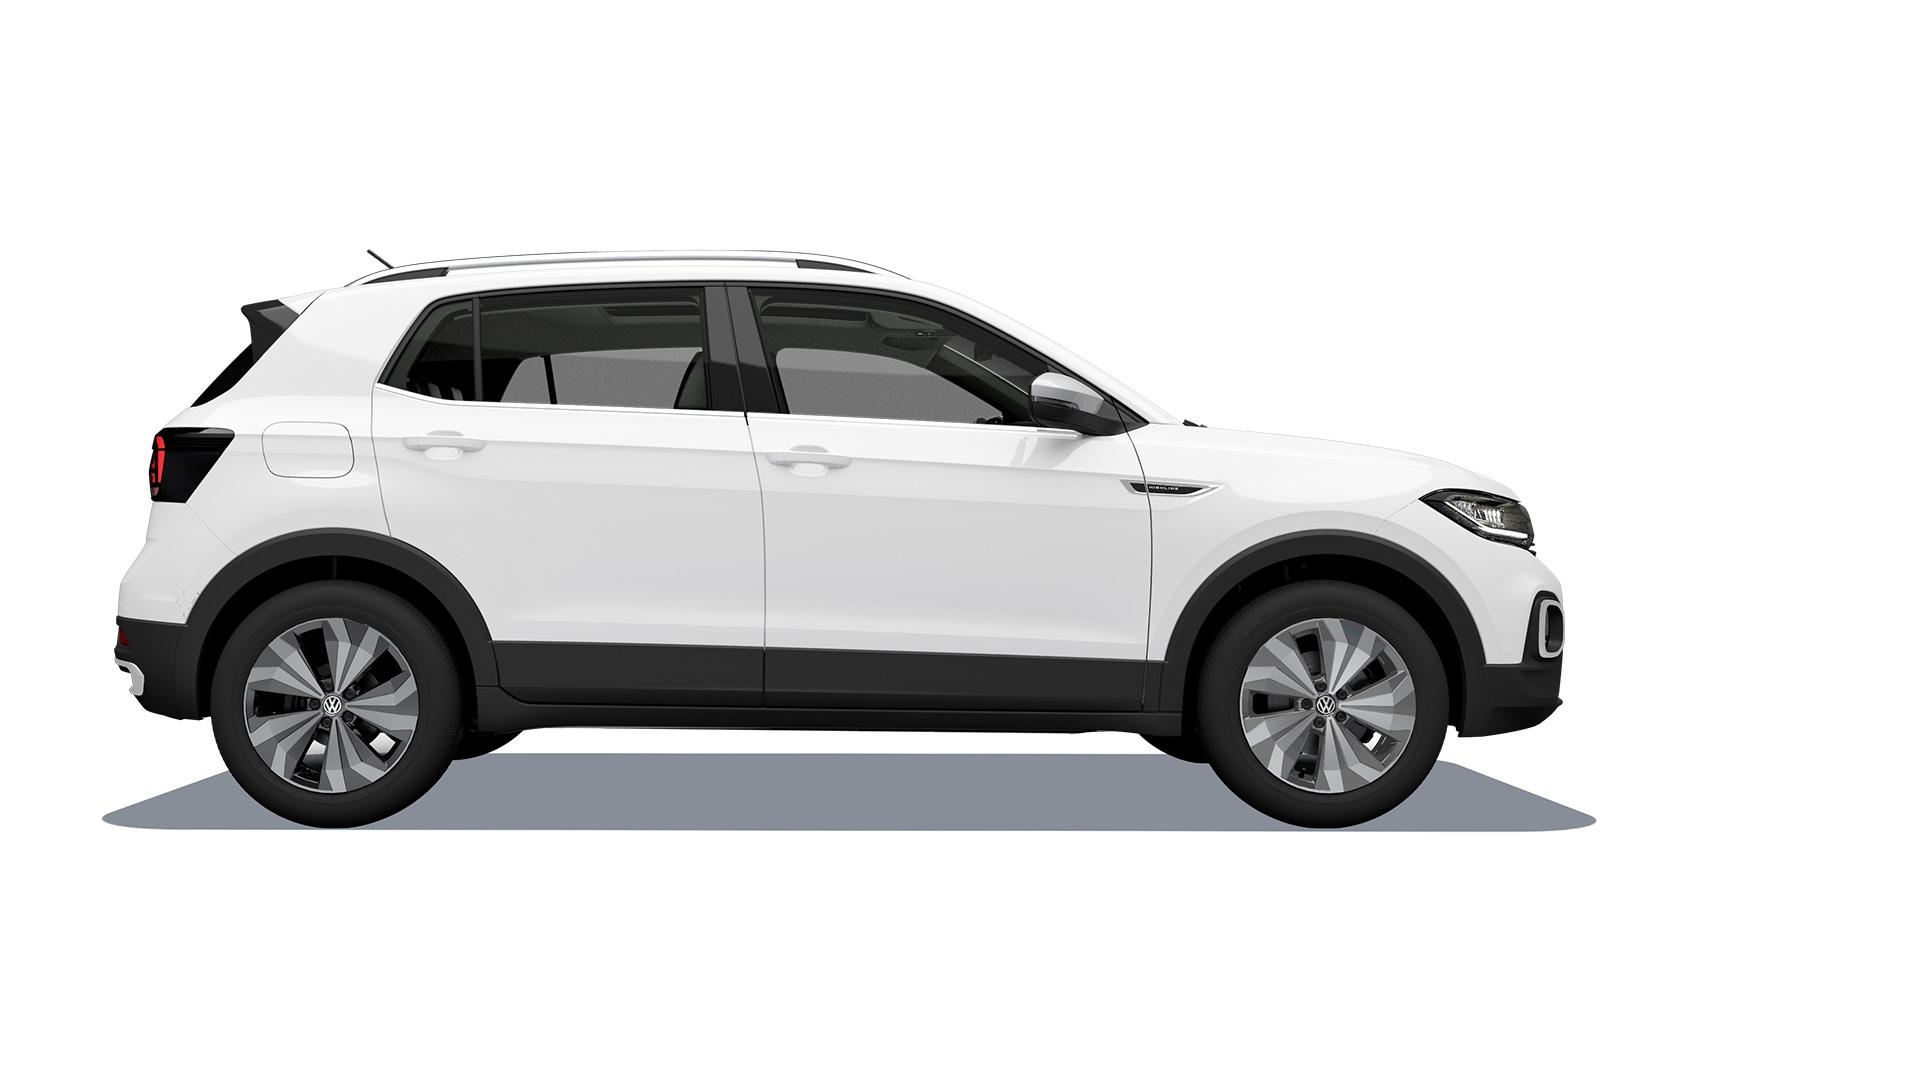 Imagen de SUV T-Cross 2020, camioneta segura para la familia